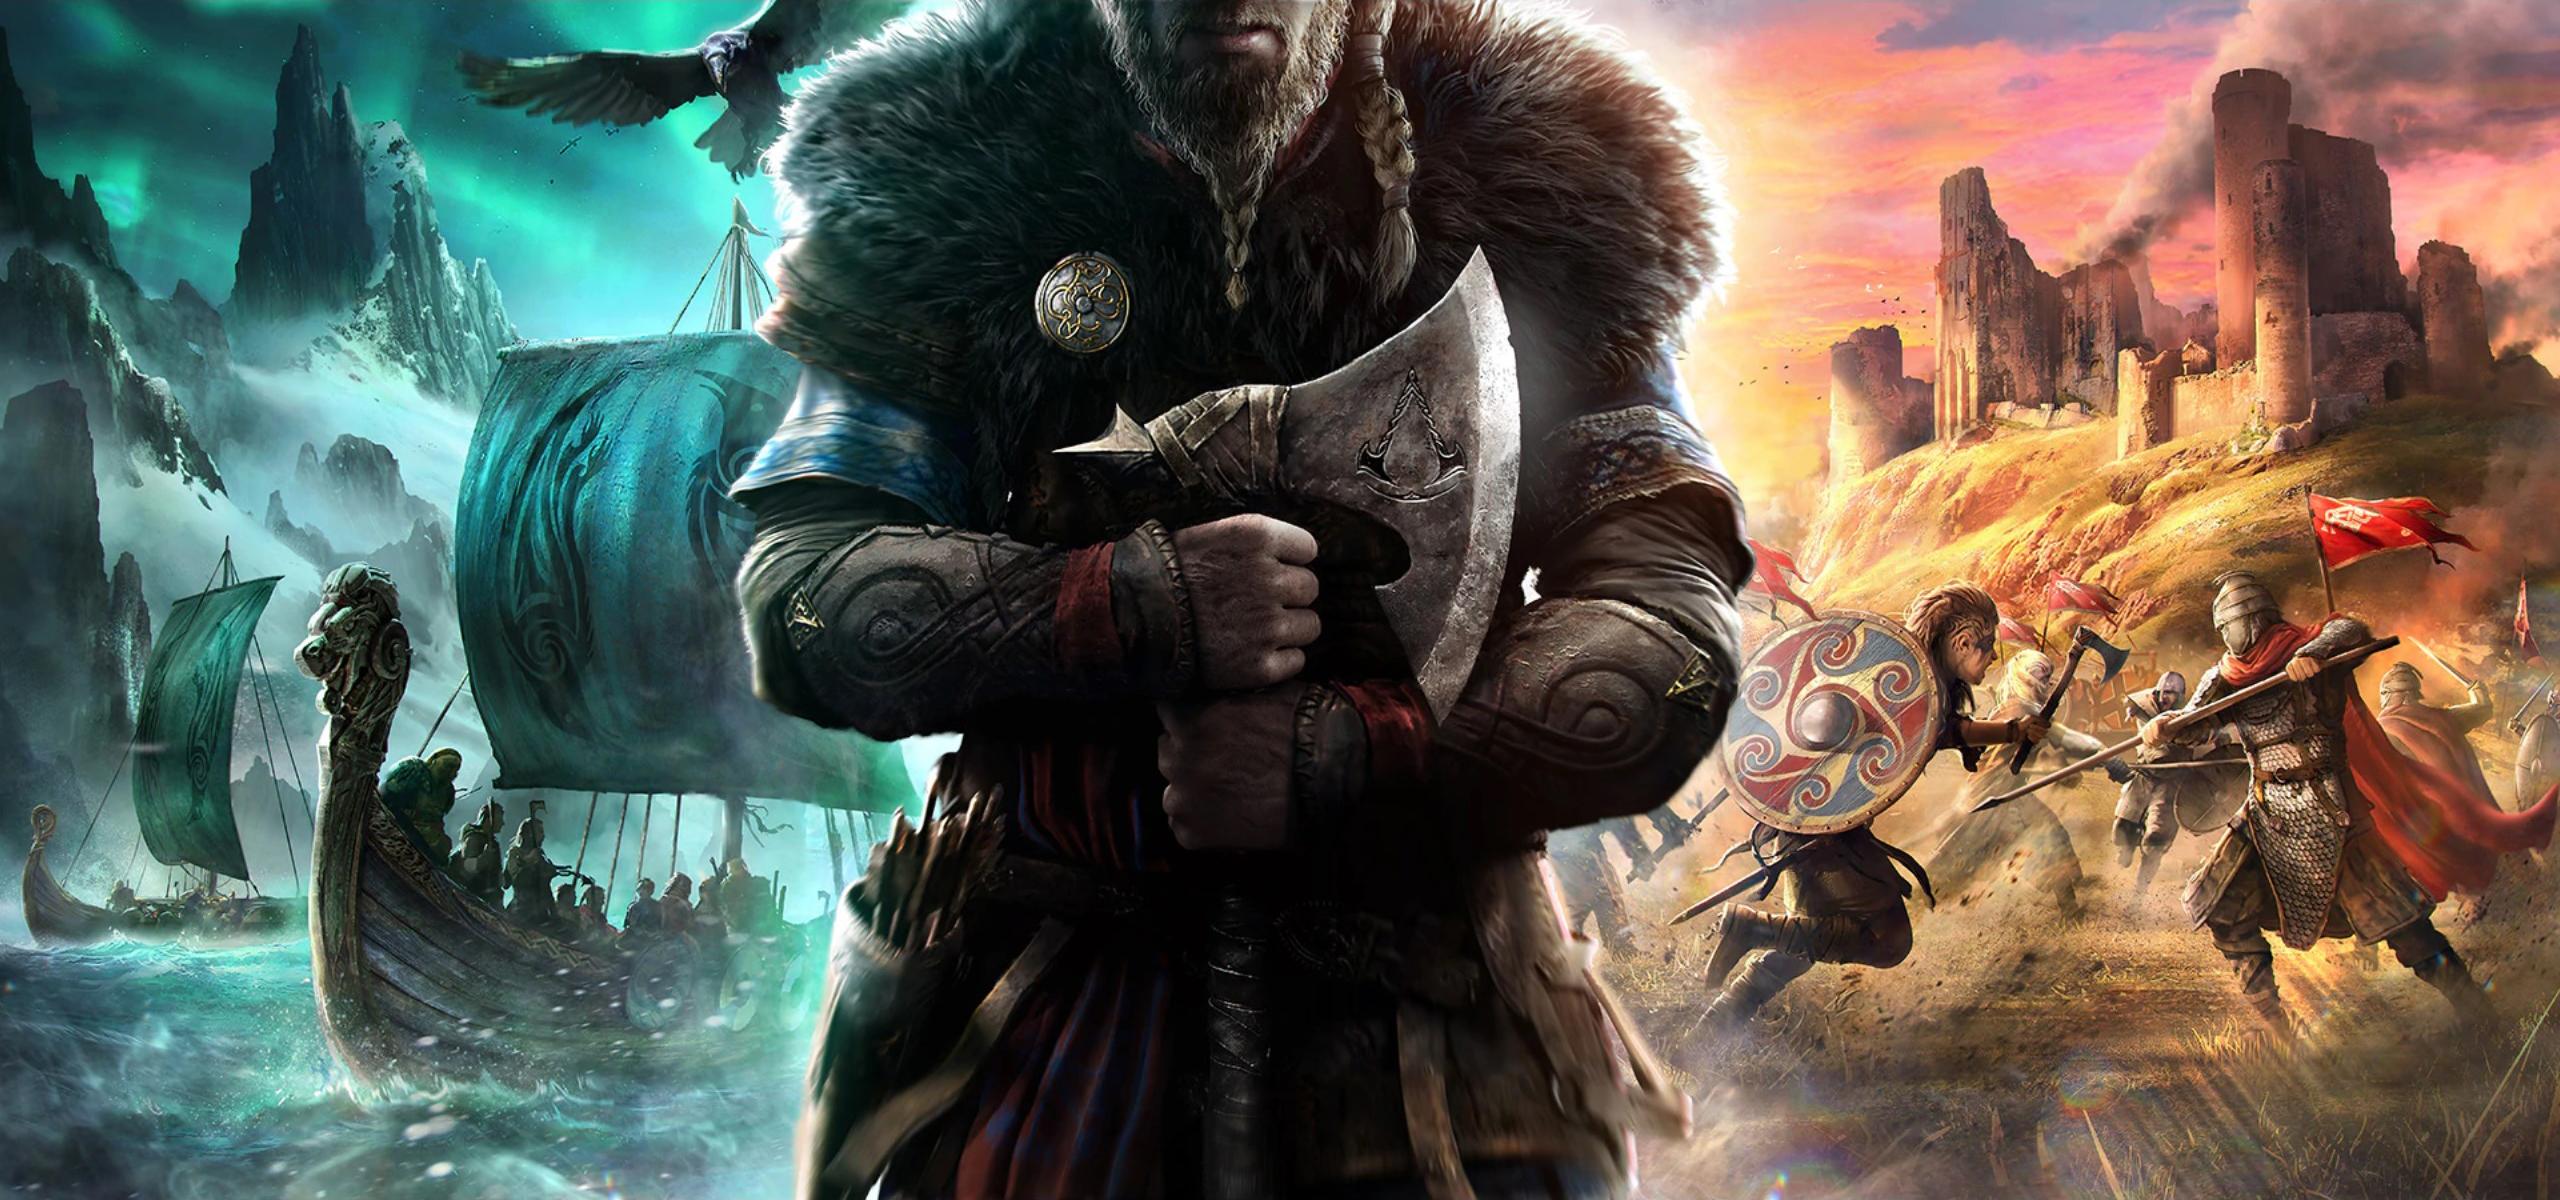 Assassin's Creed valhalla video games Vikings Scandinavia norse Norse mythology 1851749